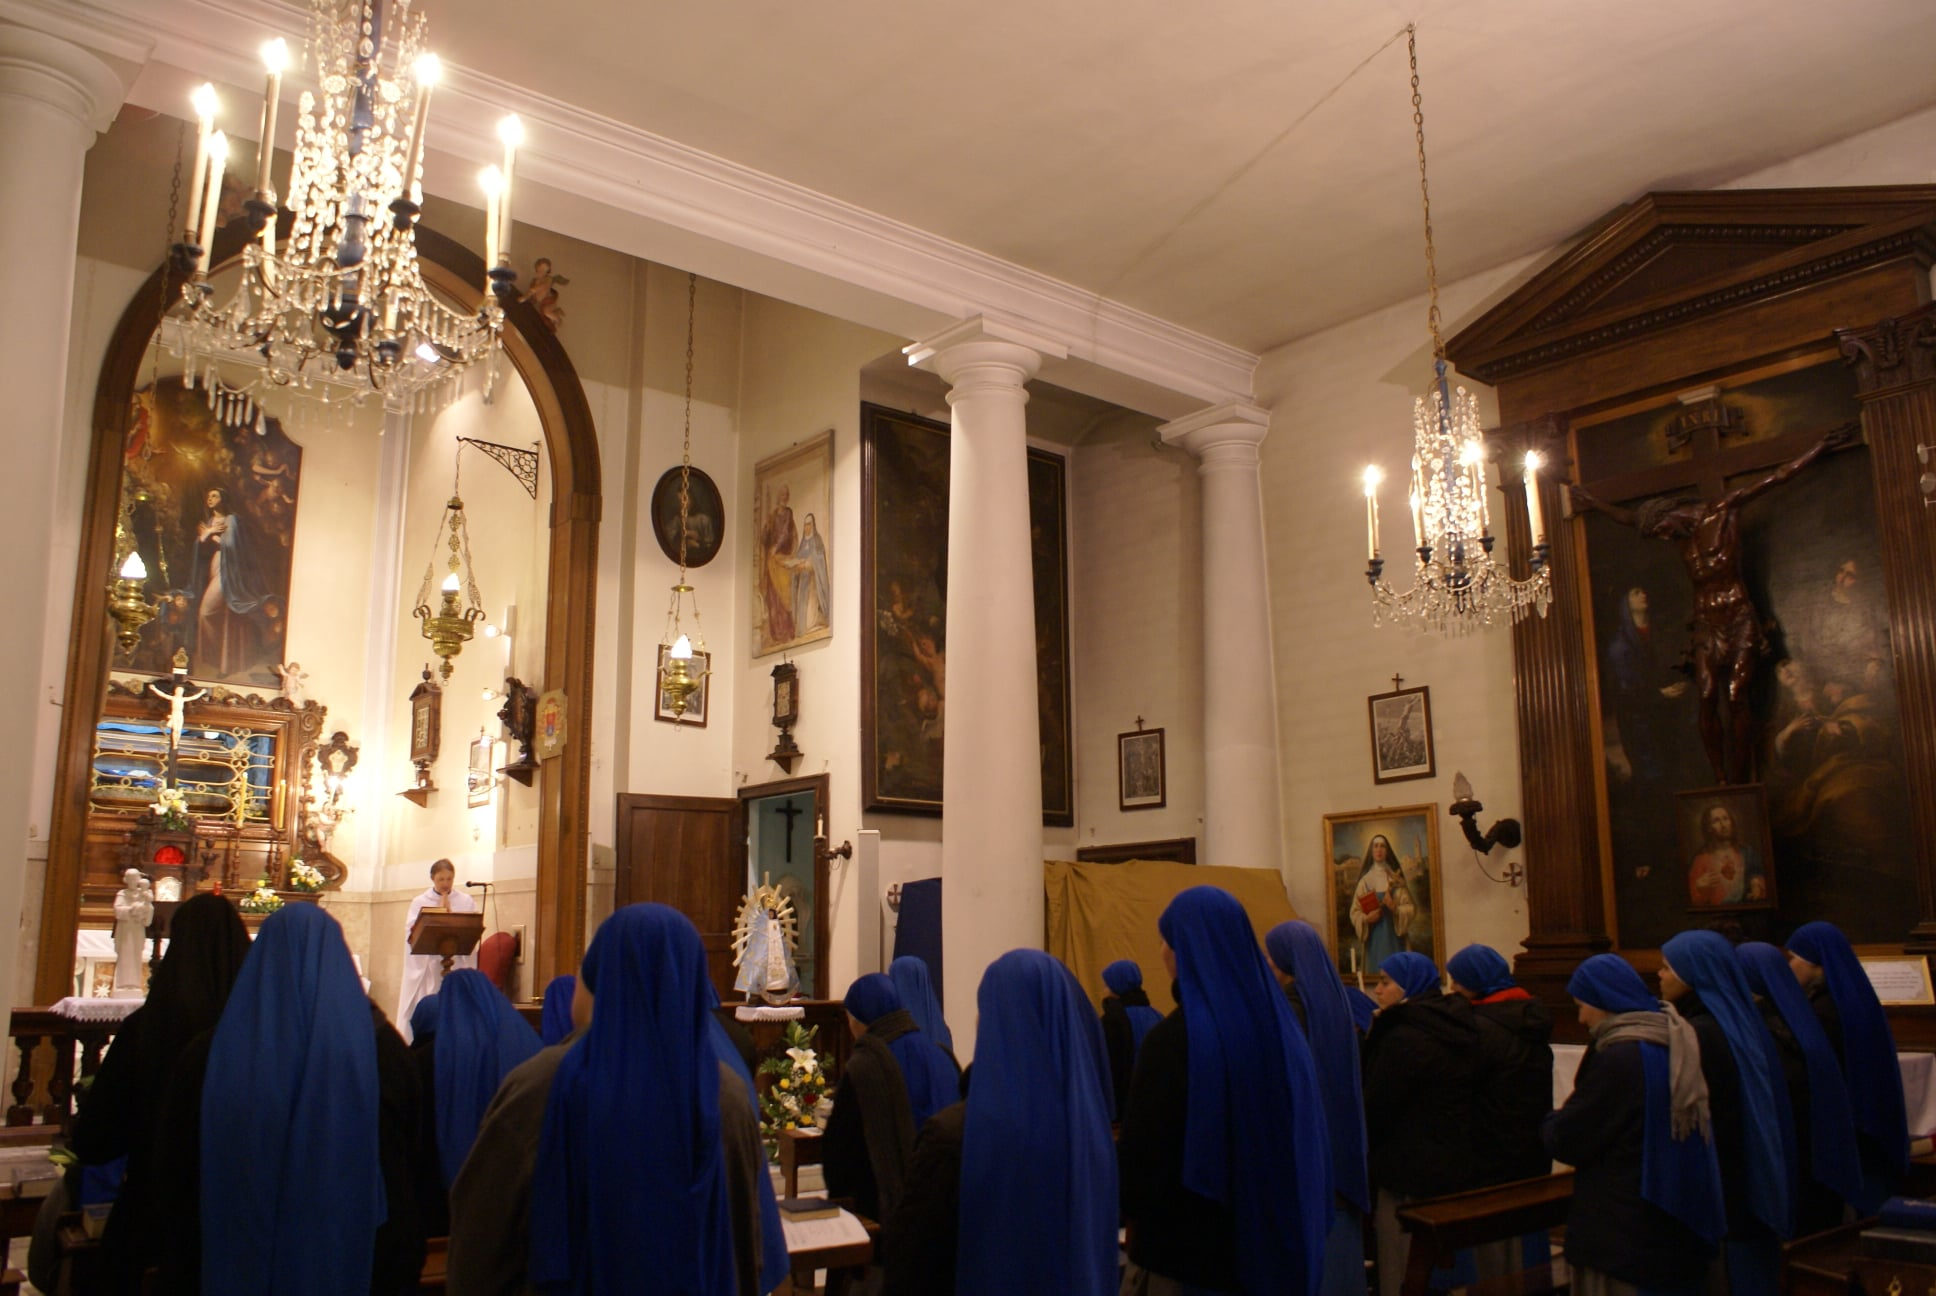 Italia - Fiesta de la Beata Maria Vittoria de Fornari Strata en Génova